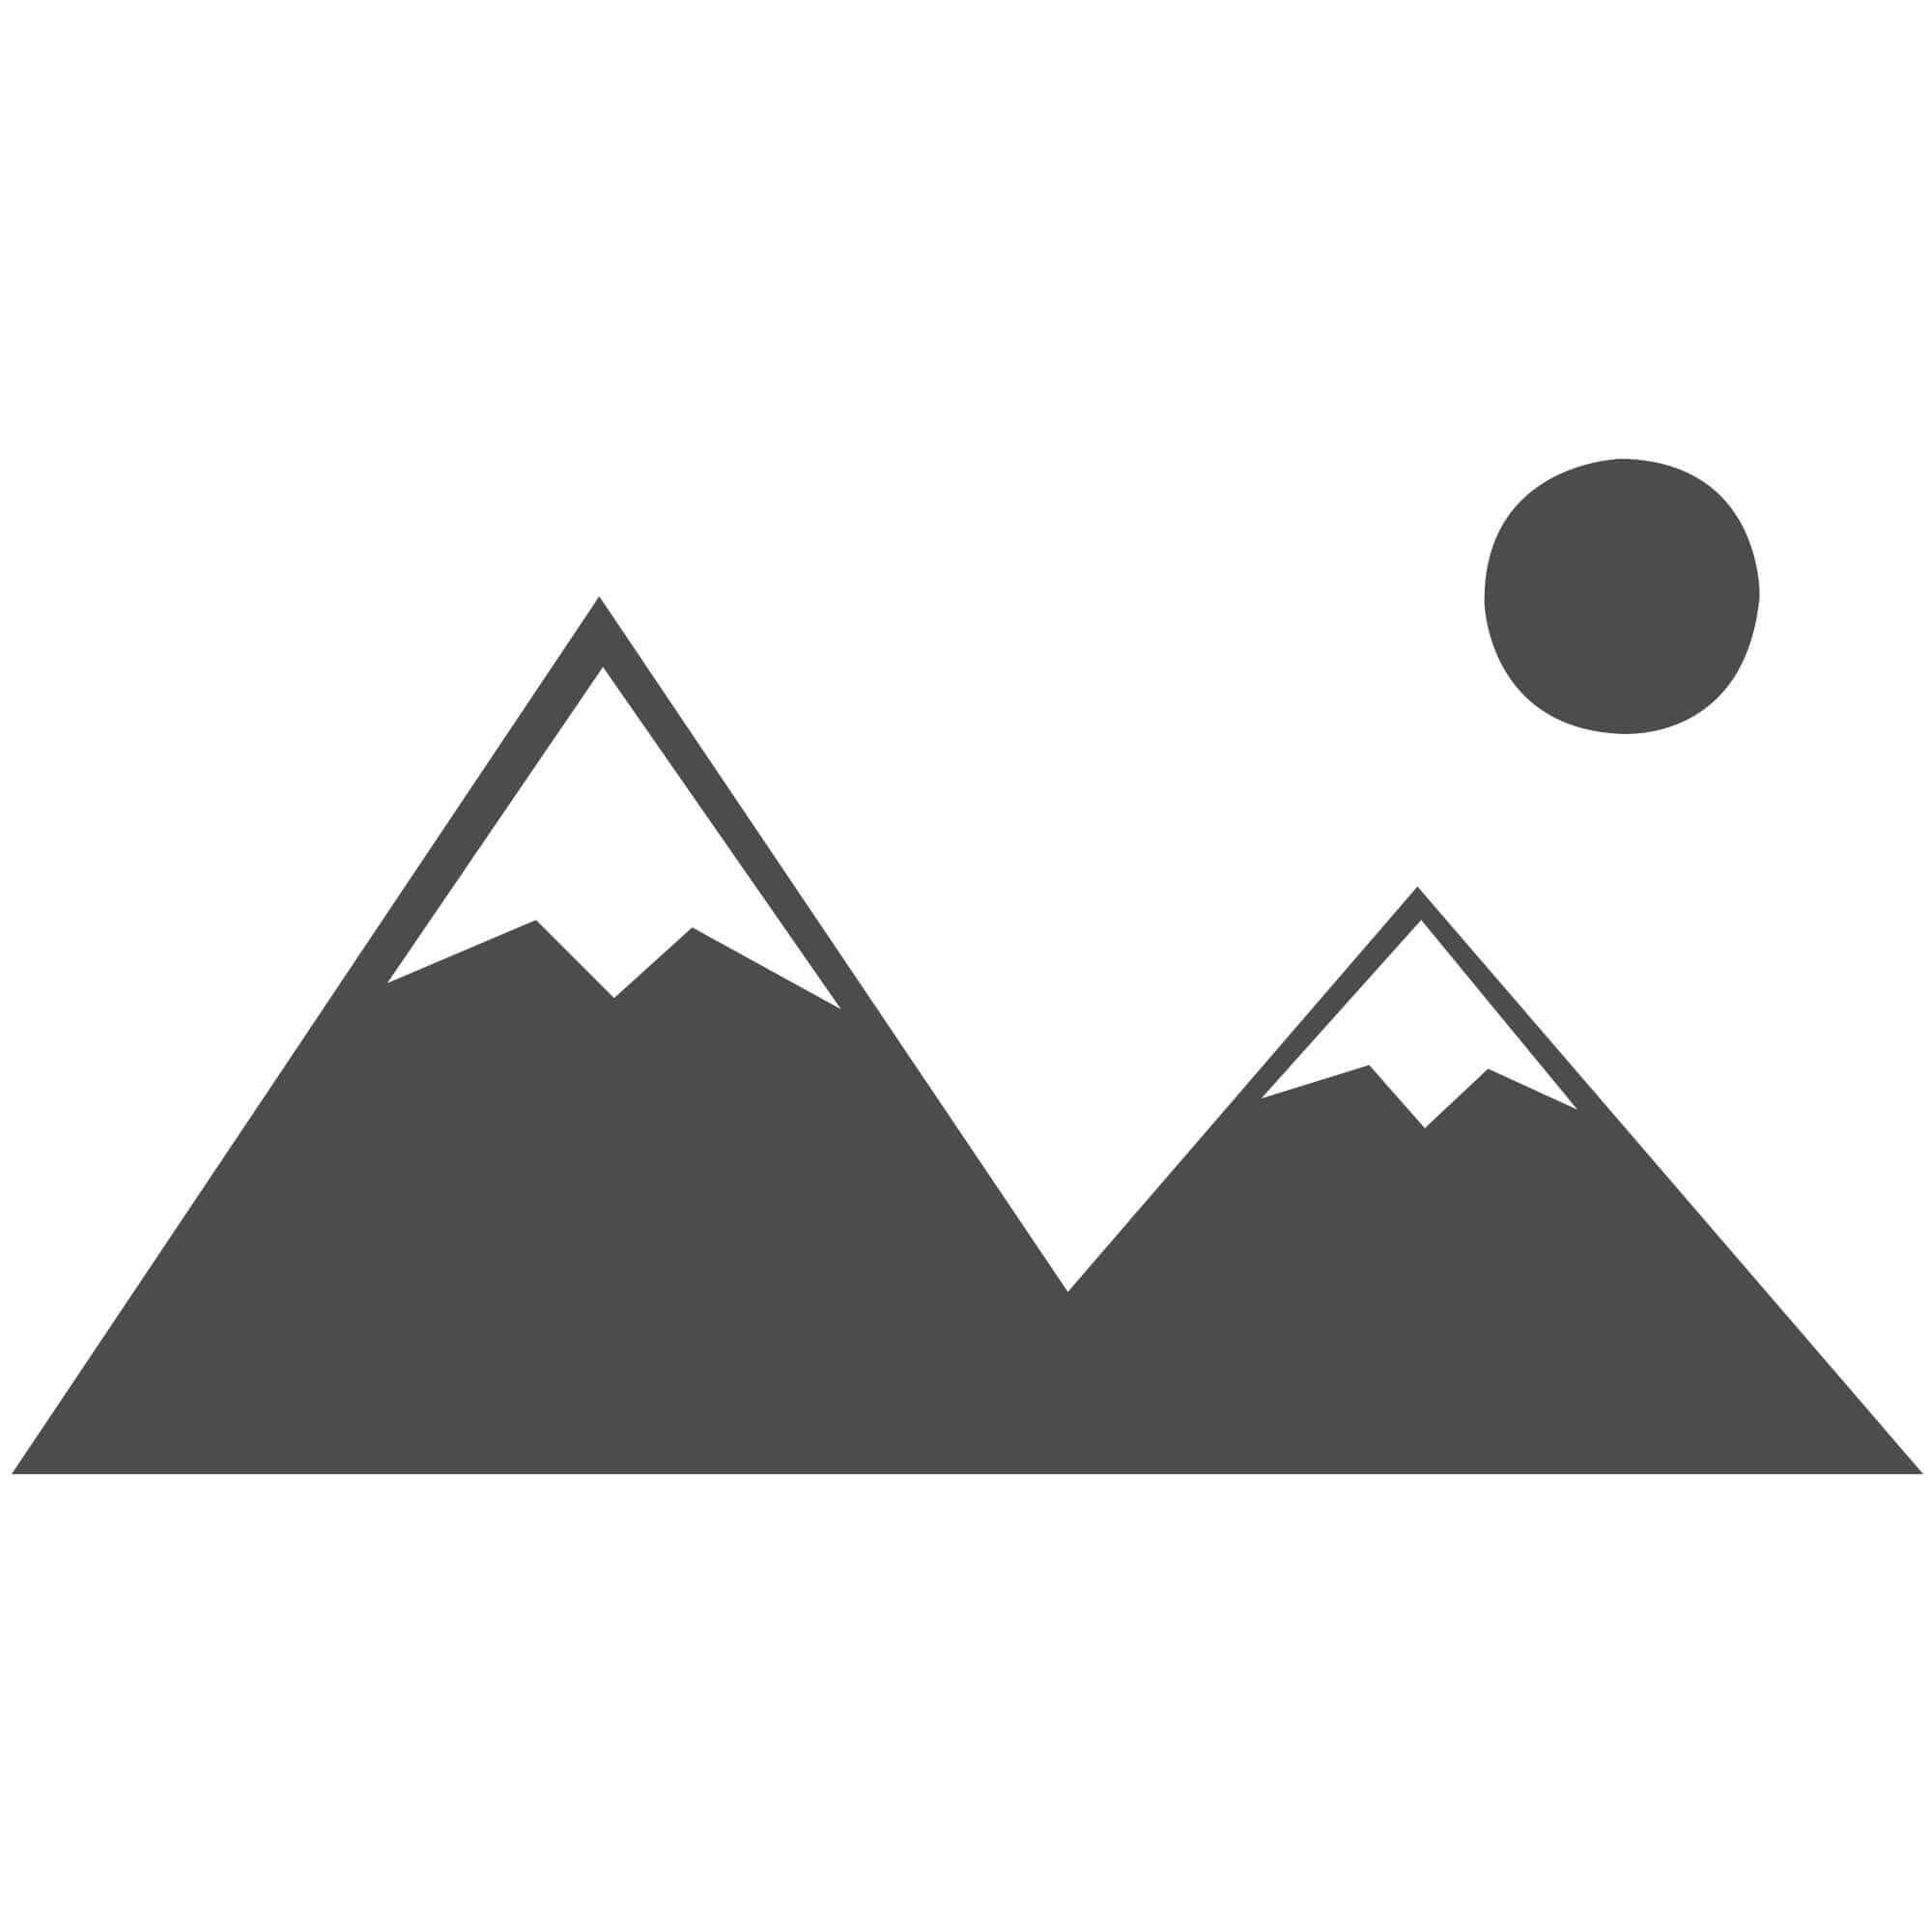 Hydraulic Radial Drill Press Rd 1600h Baileigh